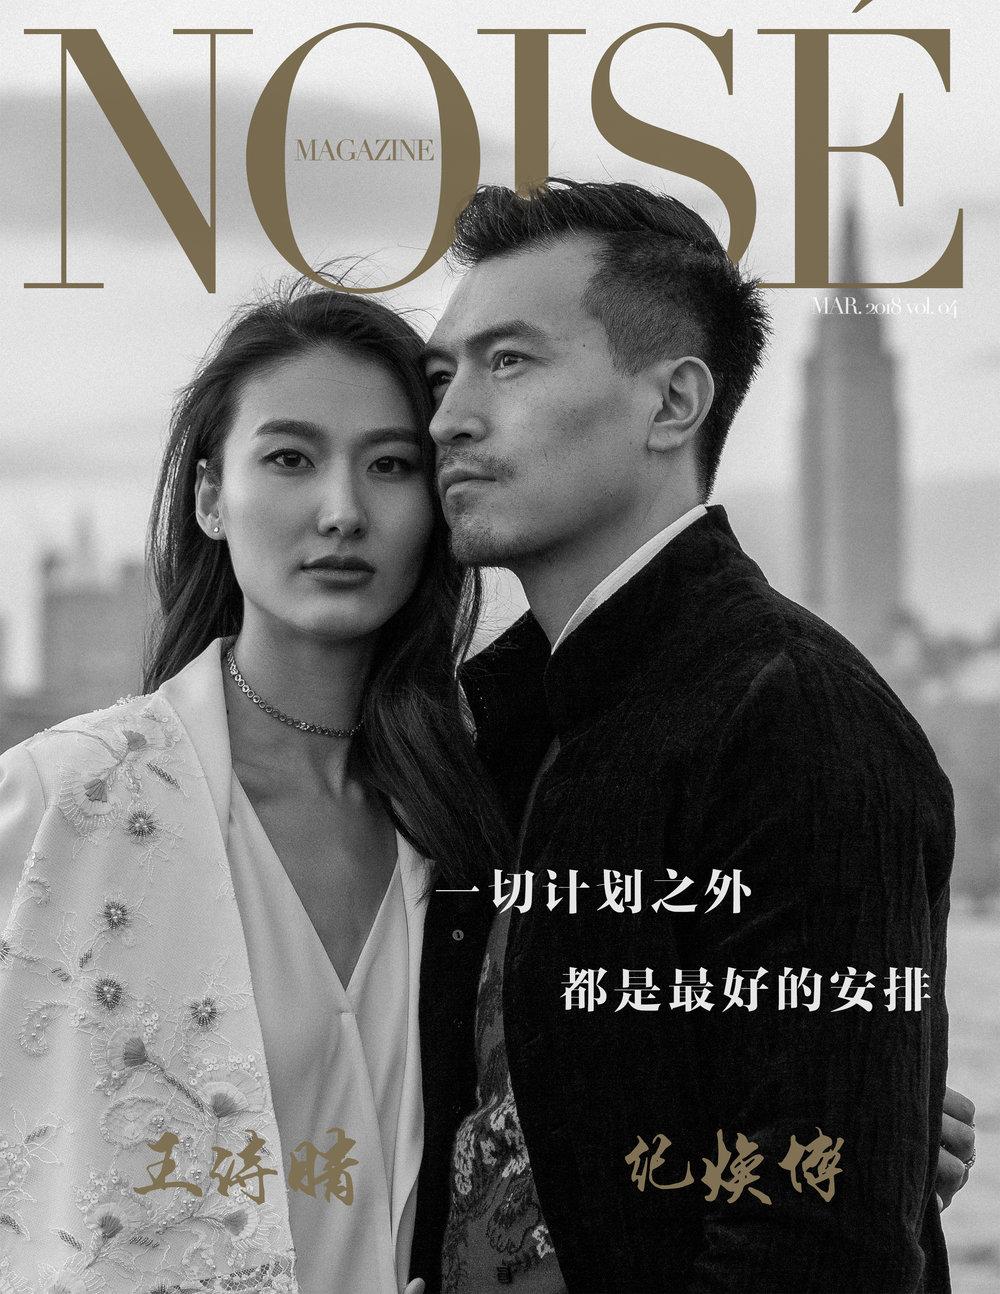 vol.03 王诗晴 纪焕博 Cover.jpg